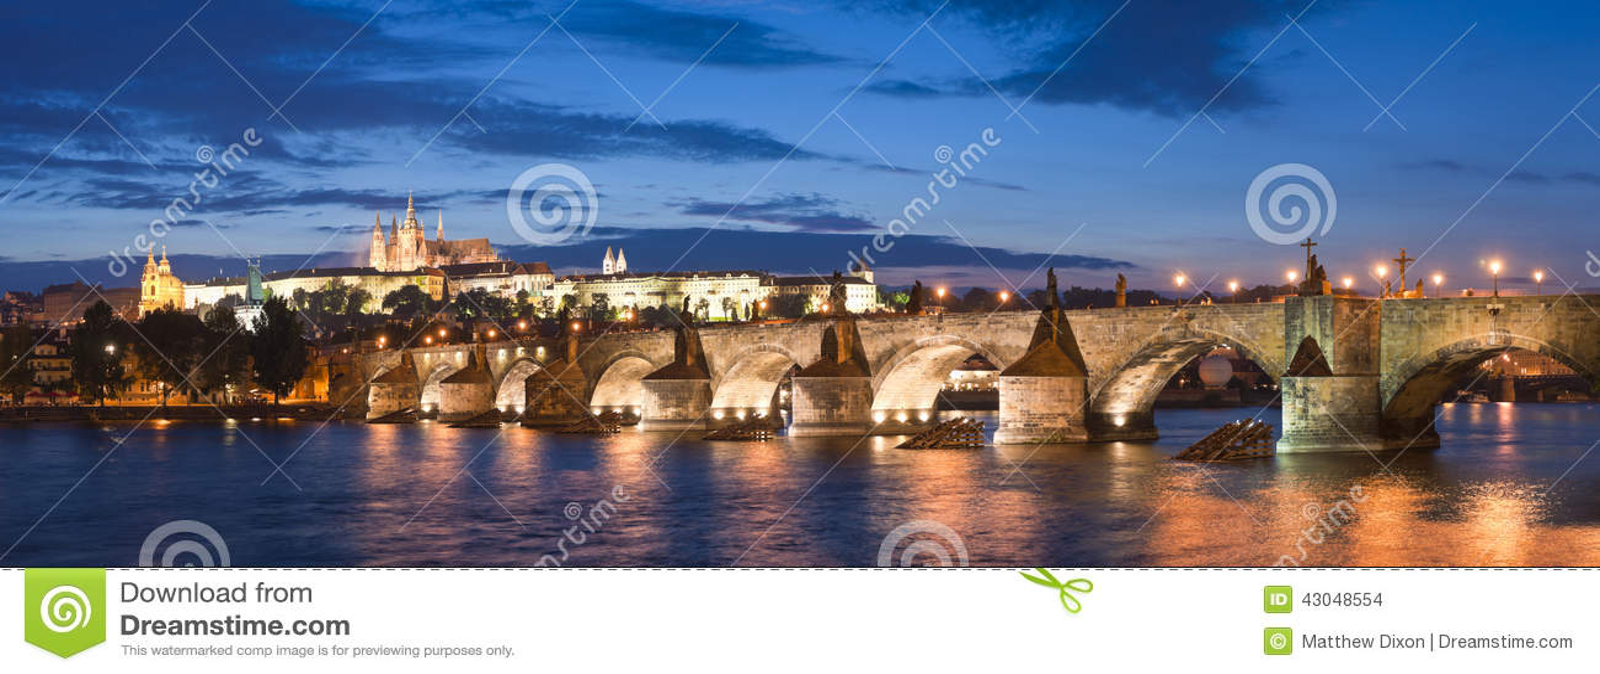 St Vitus Cathedral, castello di Praga e Charles Bridge